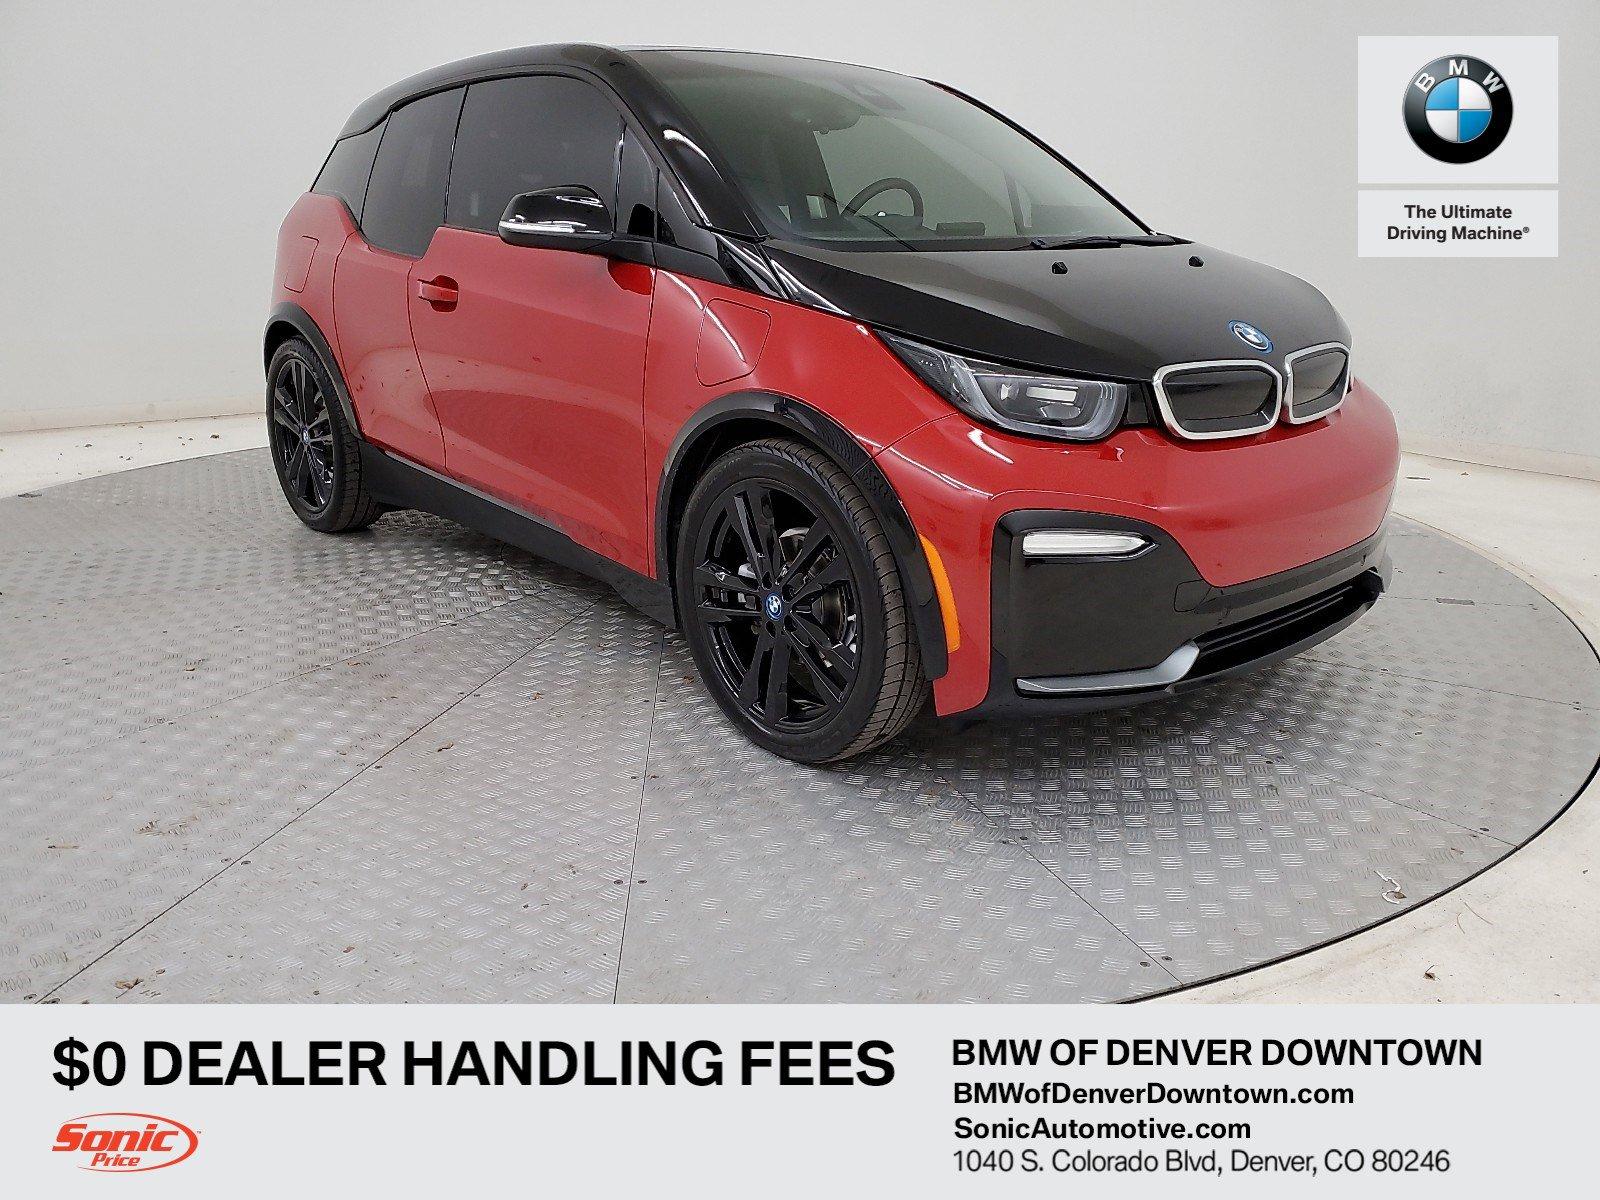 2018 BMW i3 s image